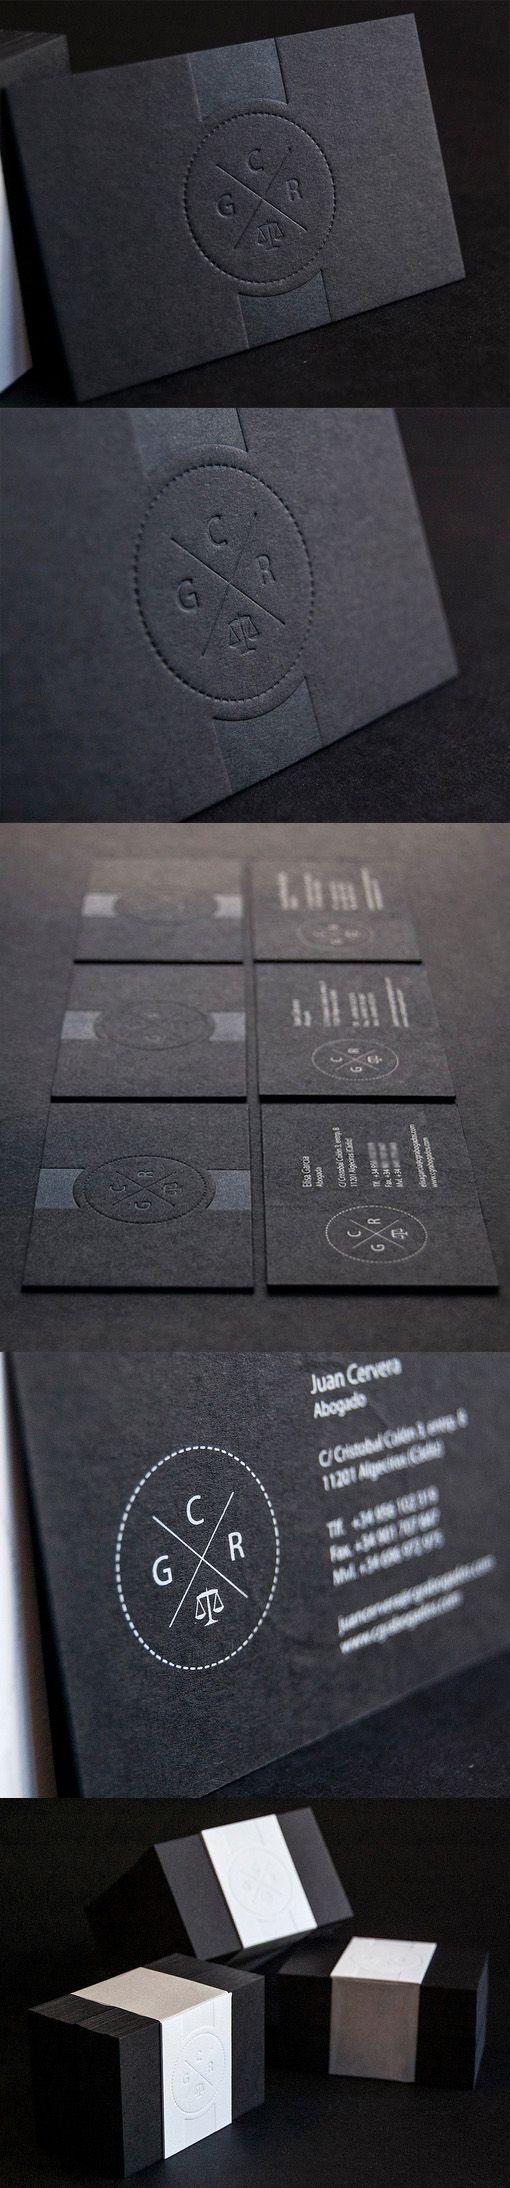 Slick And Professional Letterpress Minimalist Black Business Card Design